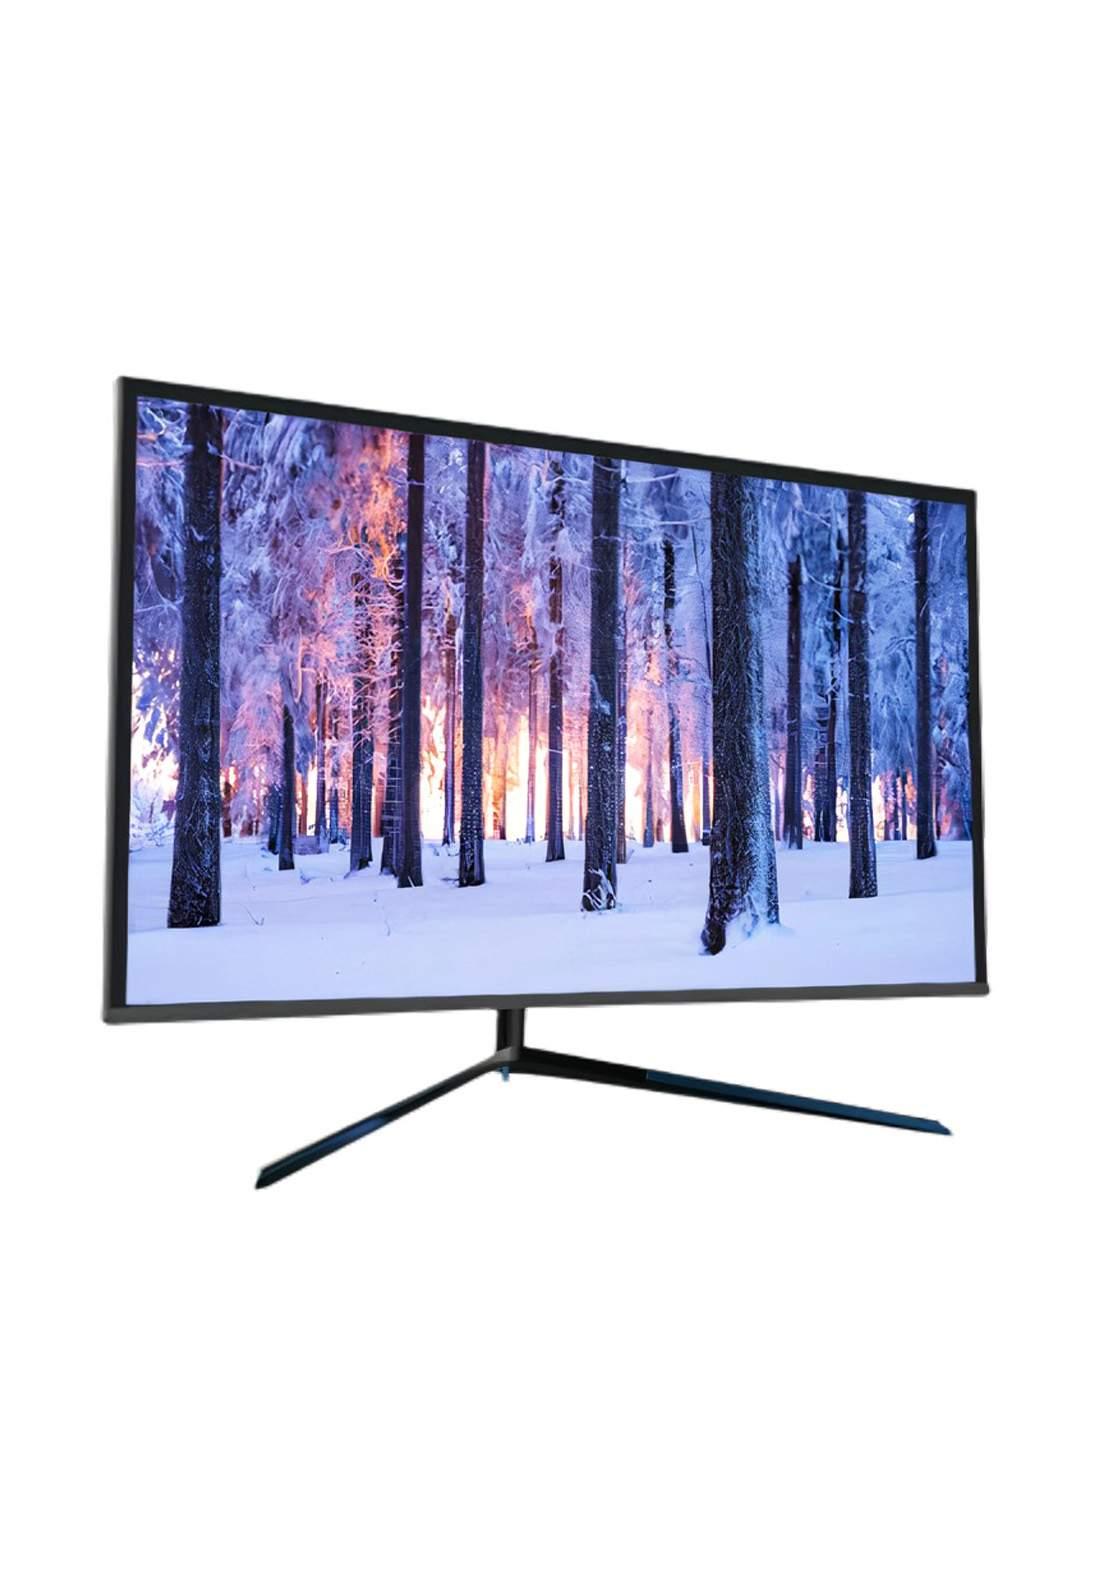 Hoesda HD27QW 27 inch 165Hz 1ms  FHD Gaming Monitor - Black شاشة العاب